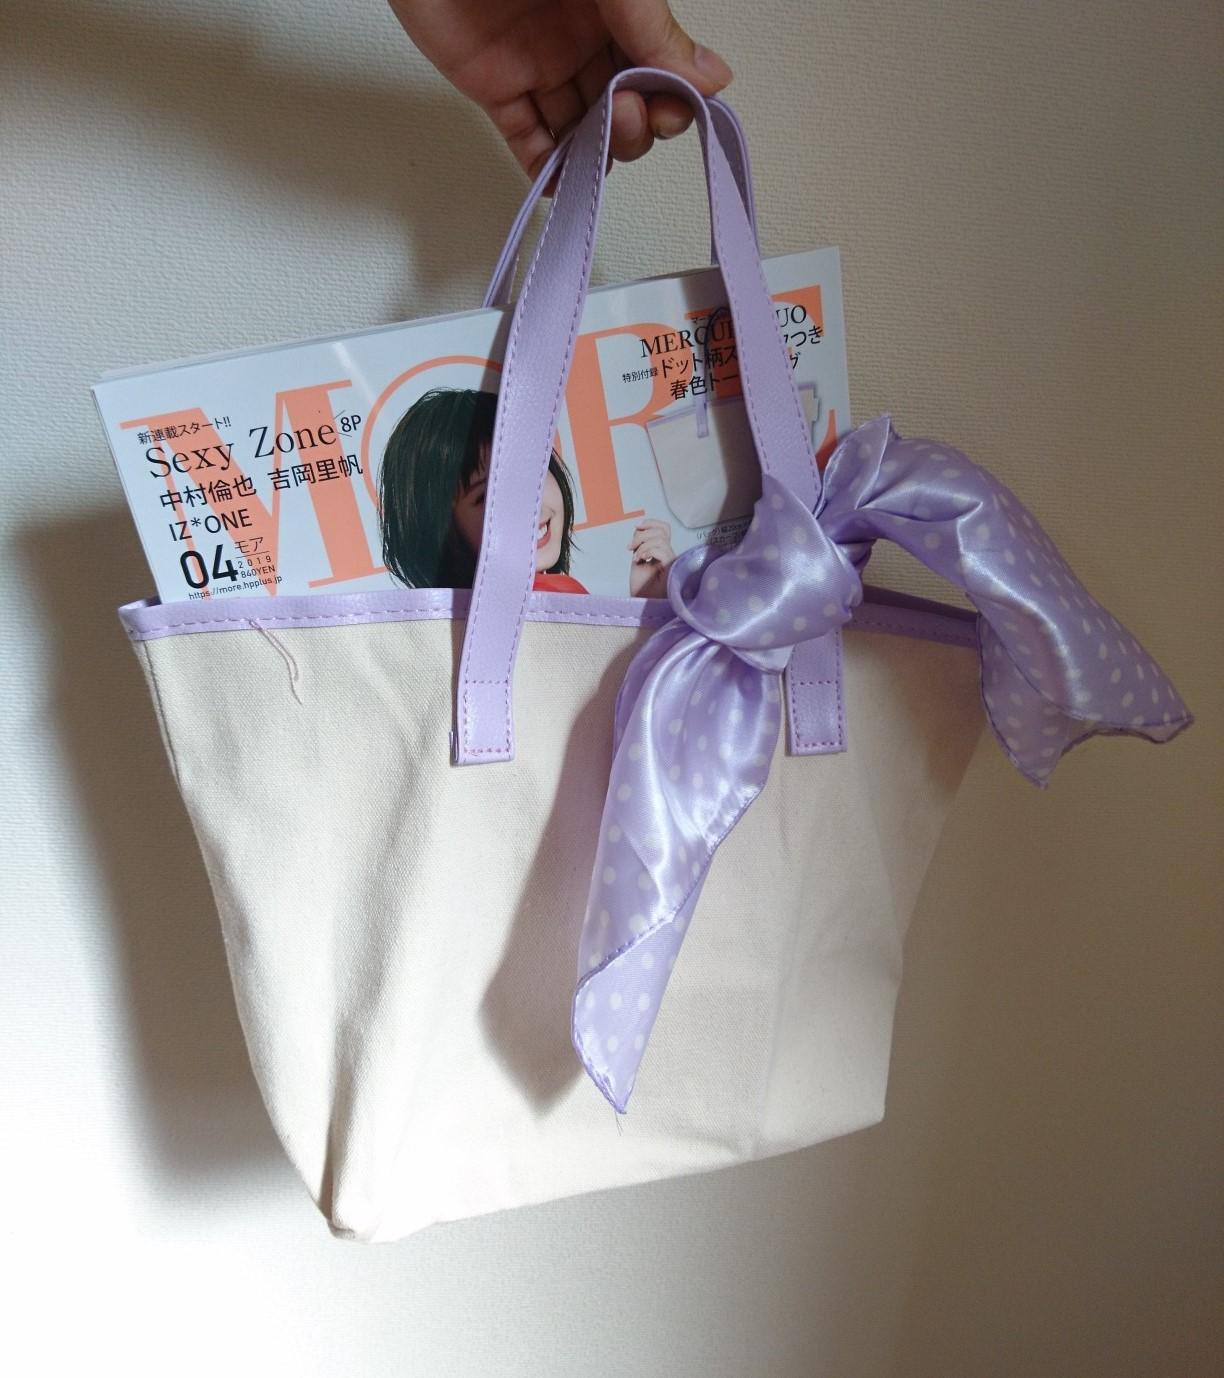 【MORE4月号付録】マーキュリーデュオ・スカーフつき春色トートバッグが使えそう!_1